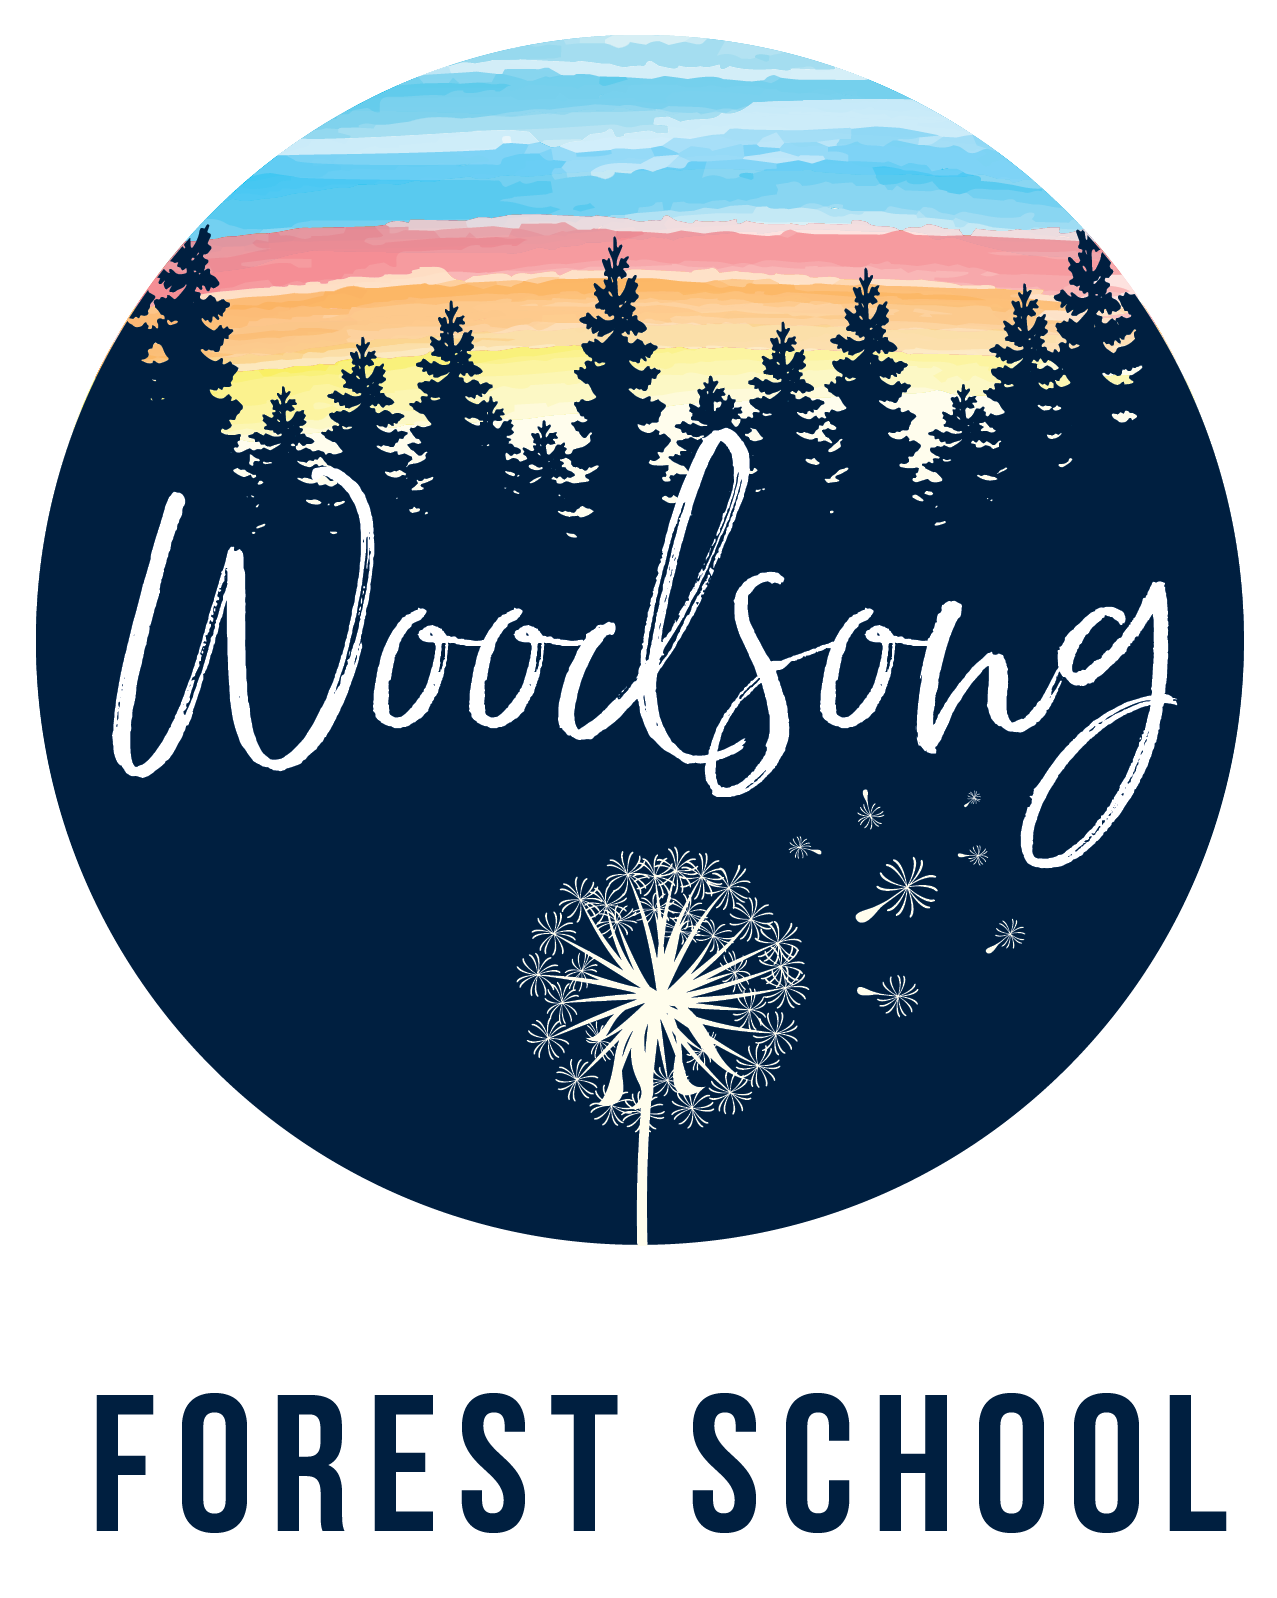 Woodsong-Forrest-School-Logo1.png